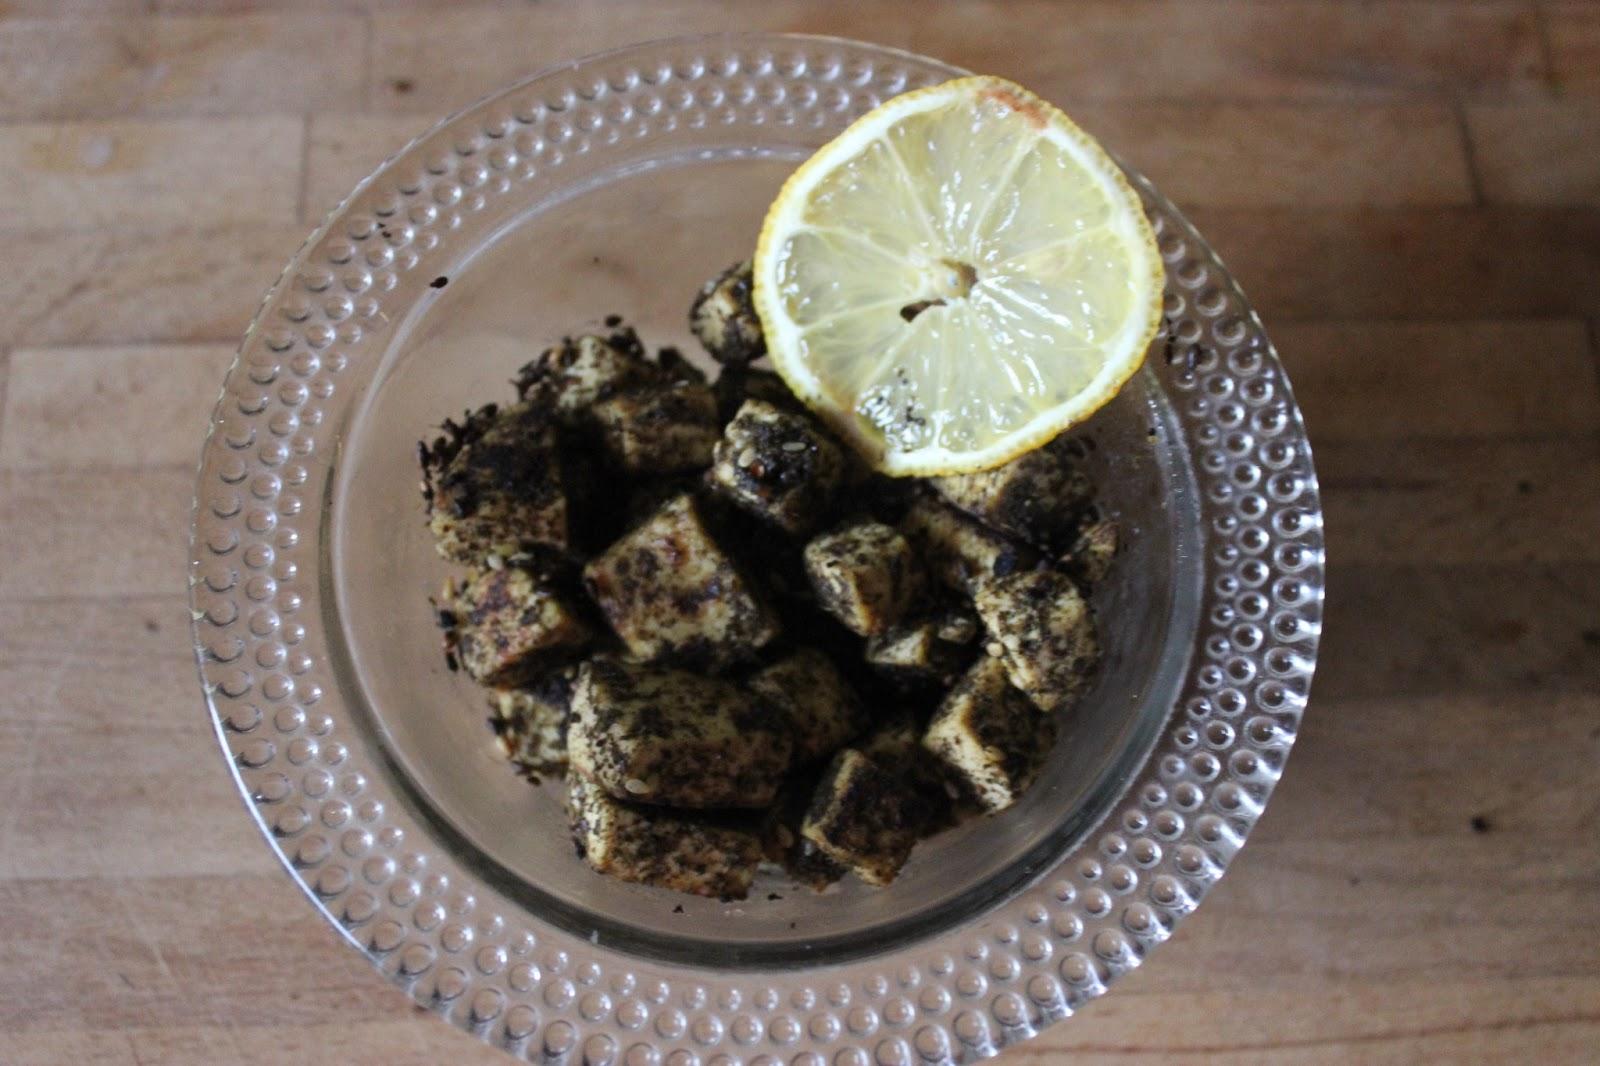 https://cuillereetsaladier.blogspot.com/2013/06/cubes-de-tofu-au-parfum-libanais.html